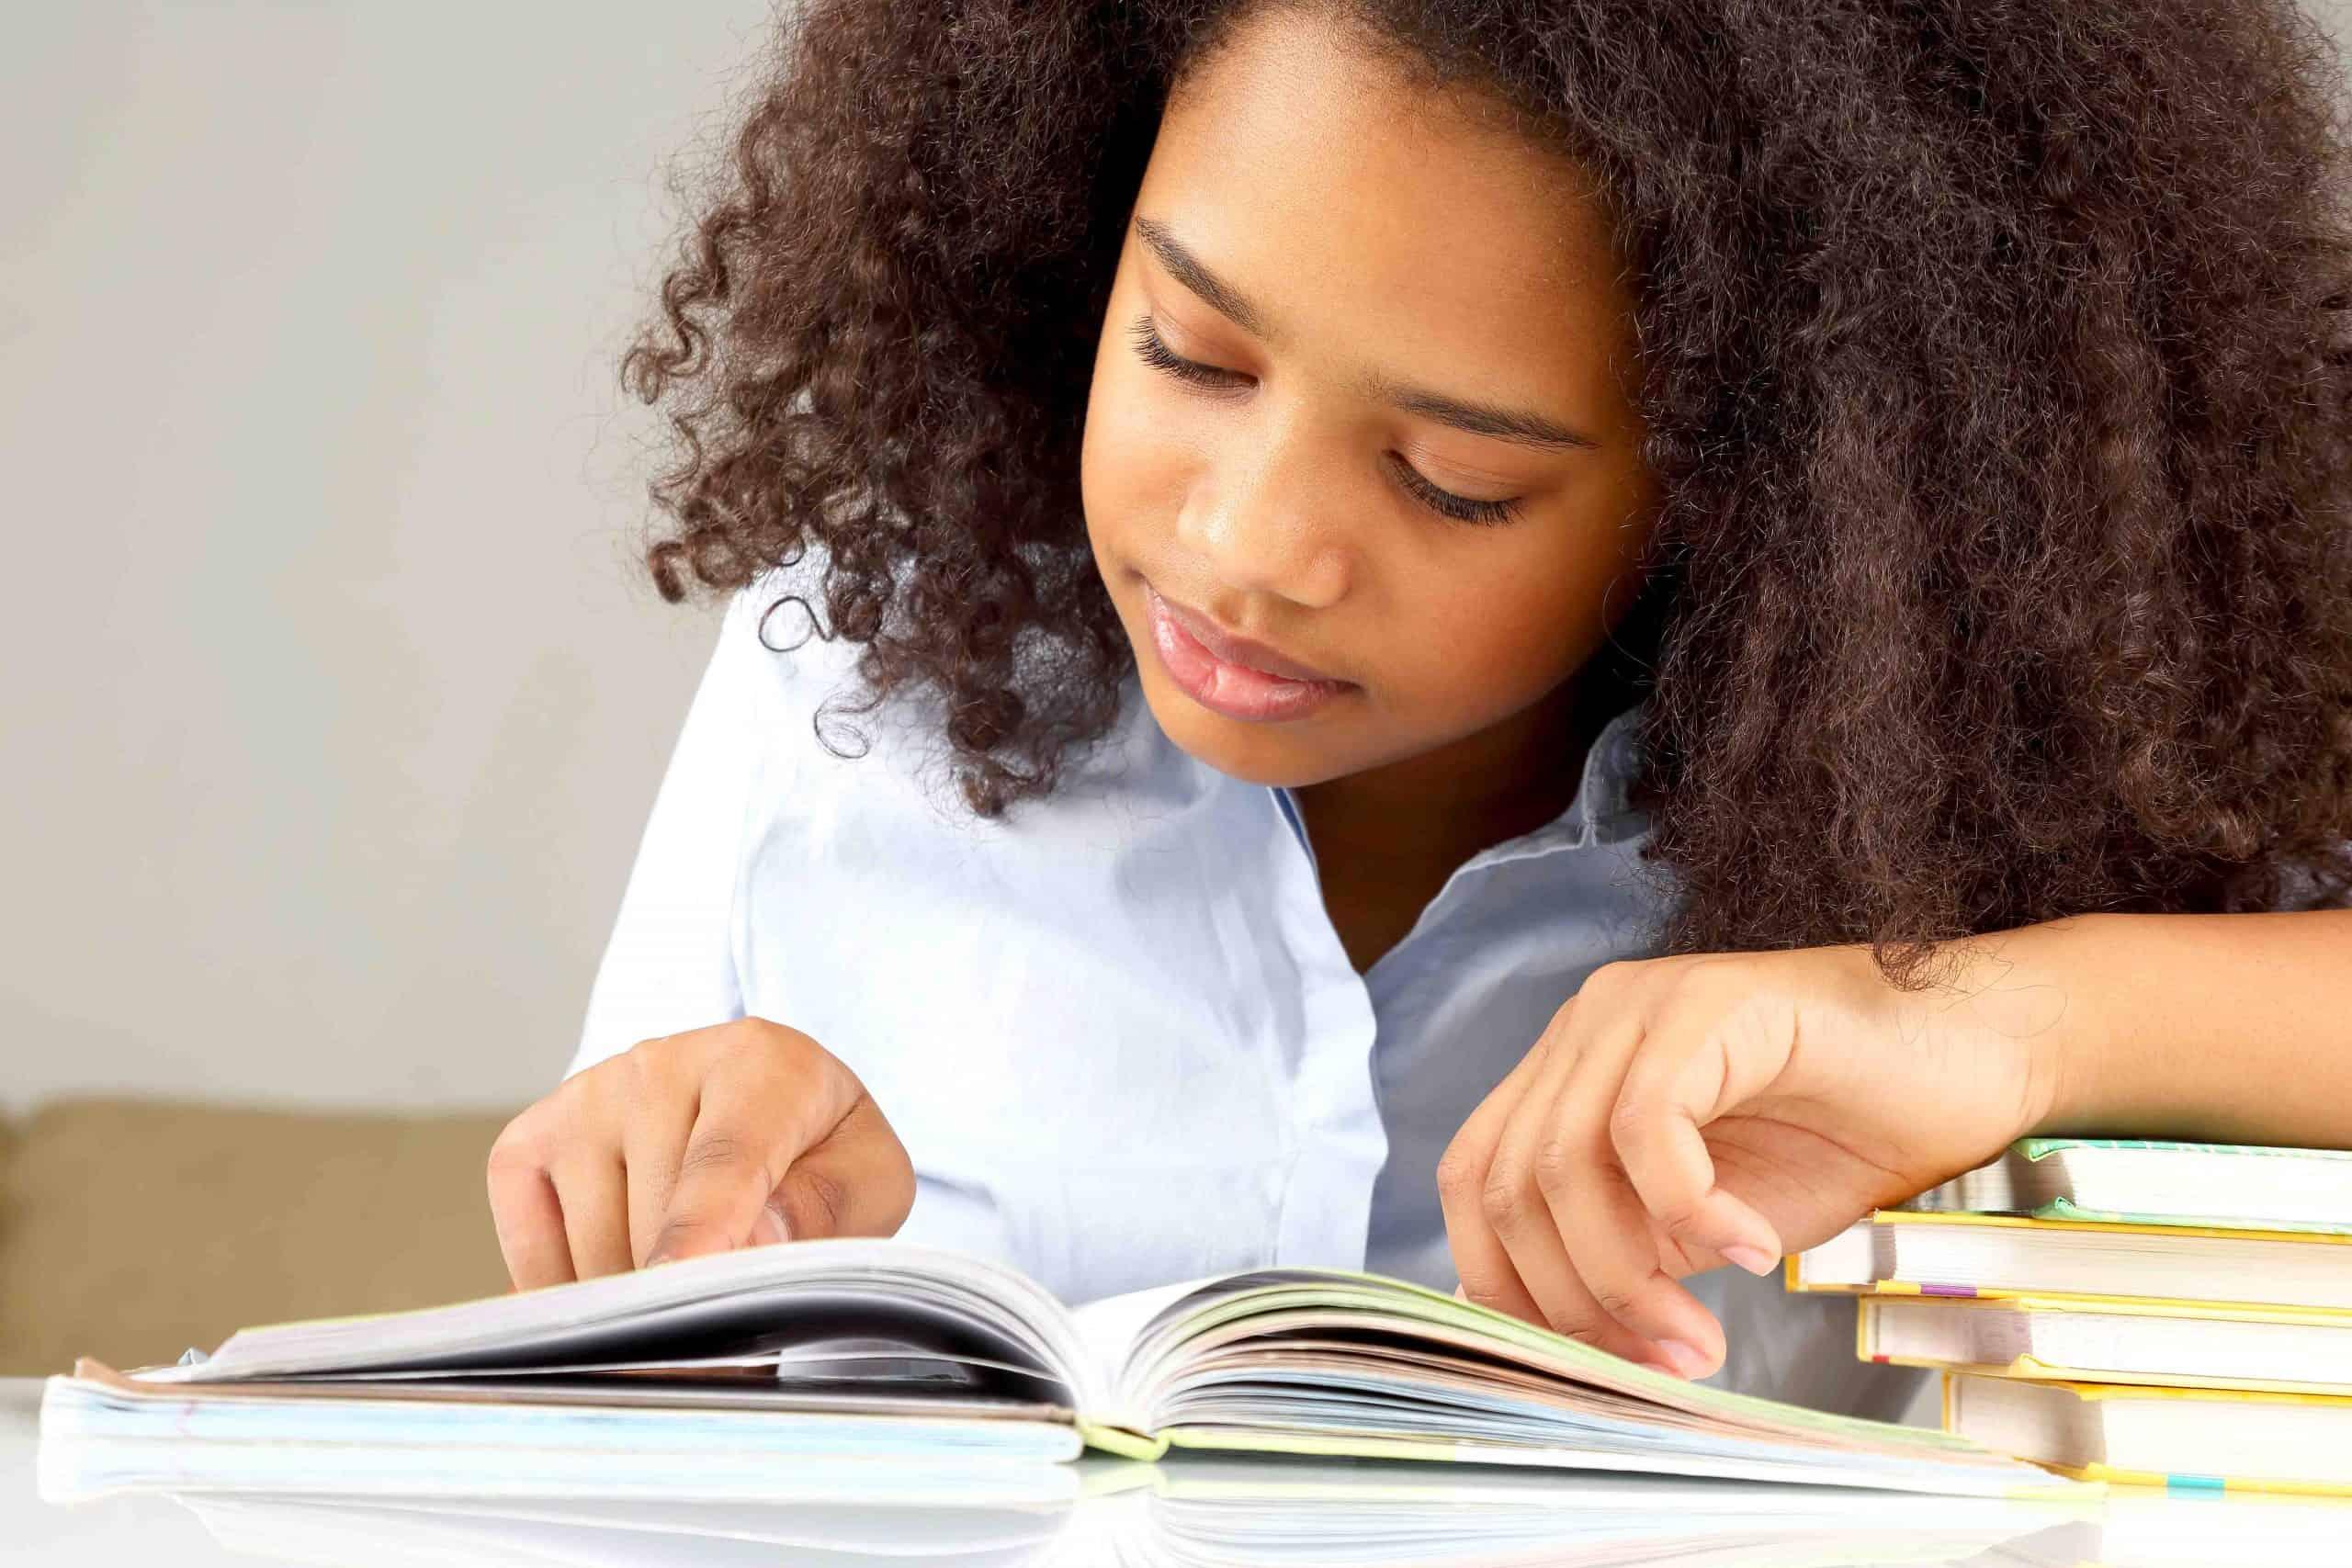 15 Best Mindfulness Books for Kids